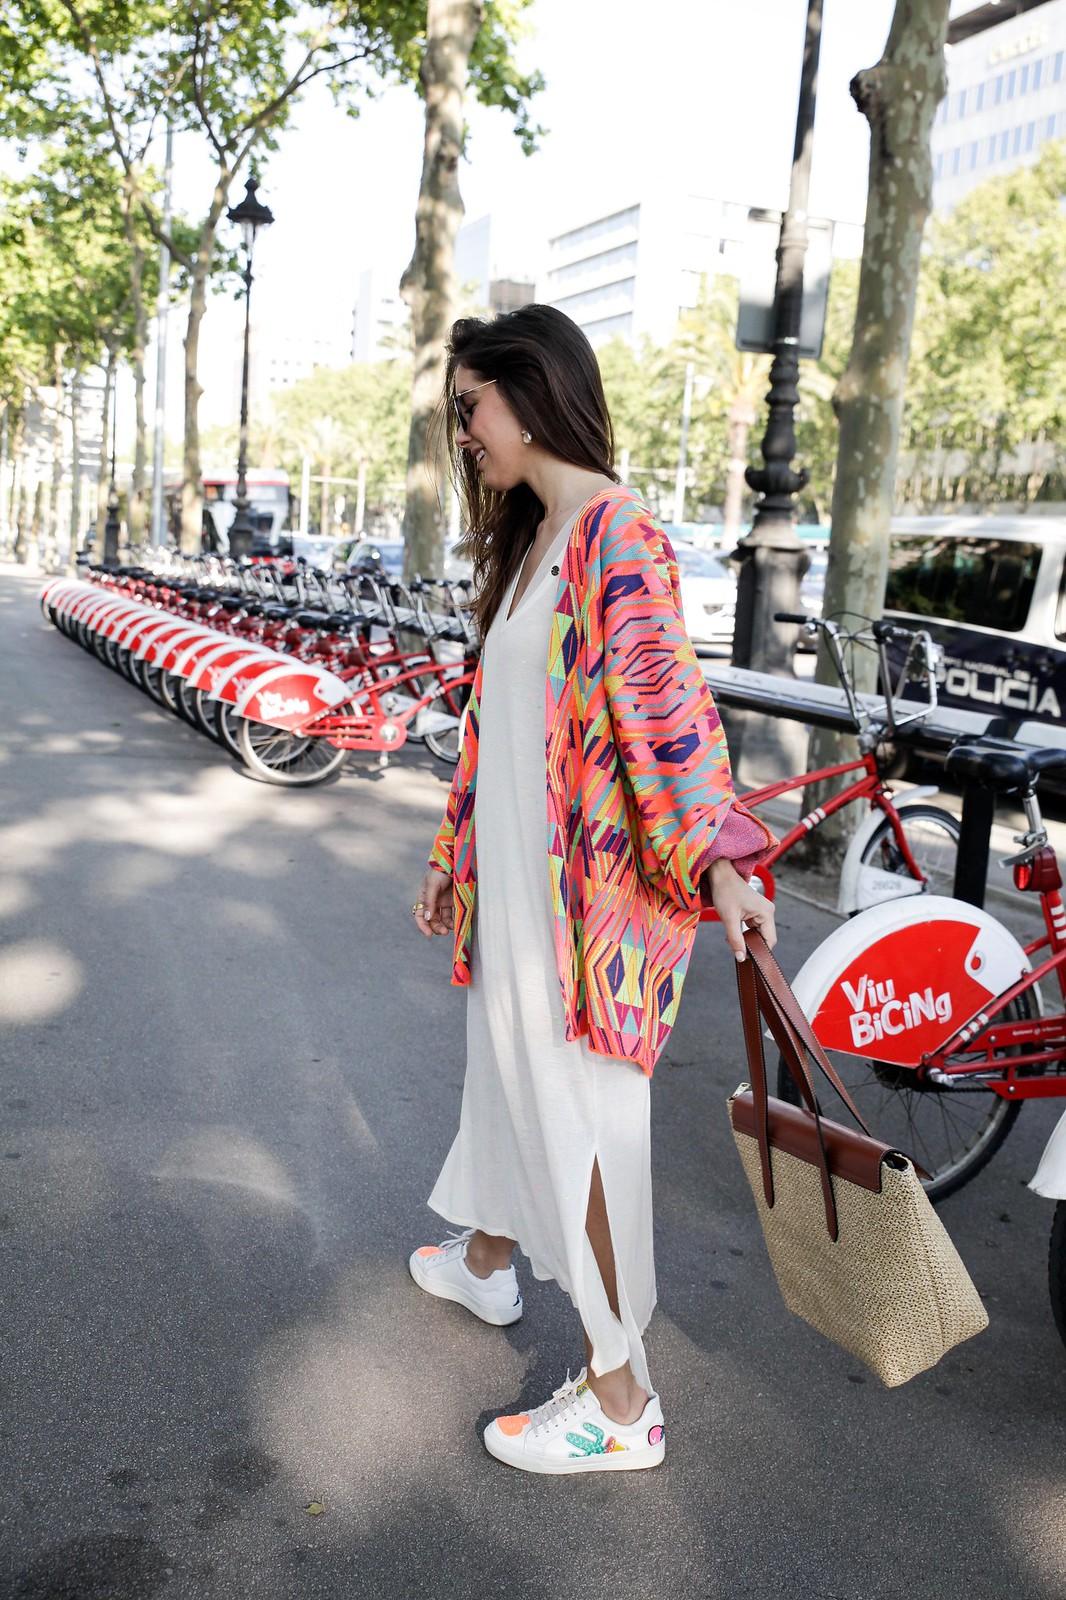 012_kimono_look_street_style_barcelona_theguestgirl_pepe_moll_ruga_caroline_svedbom_kapten_son